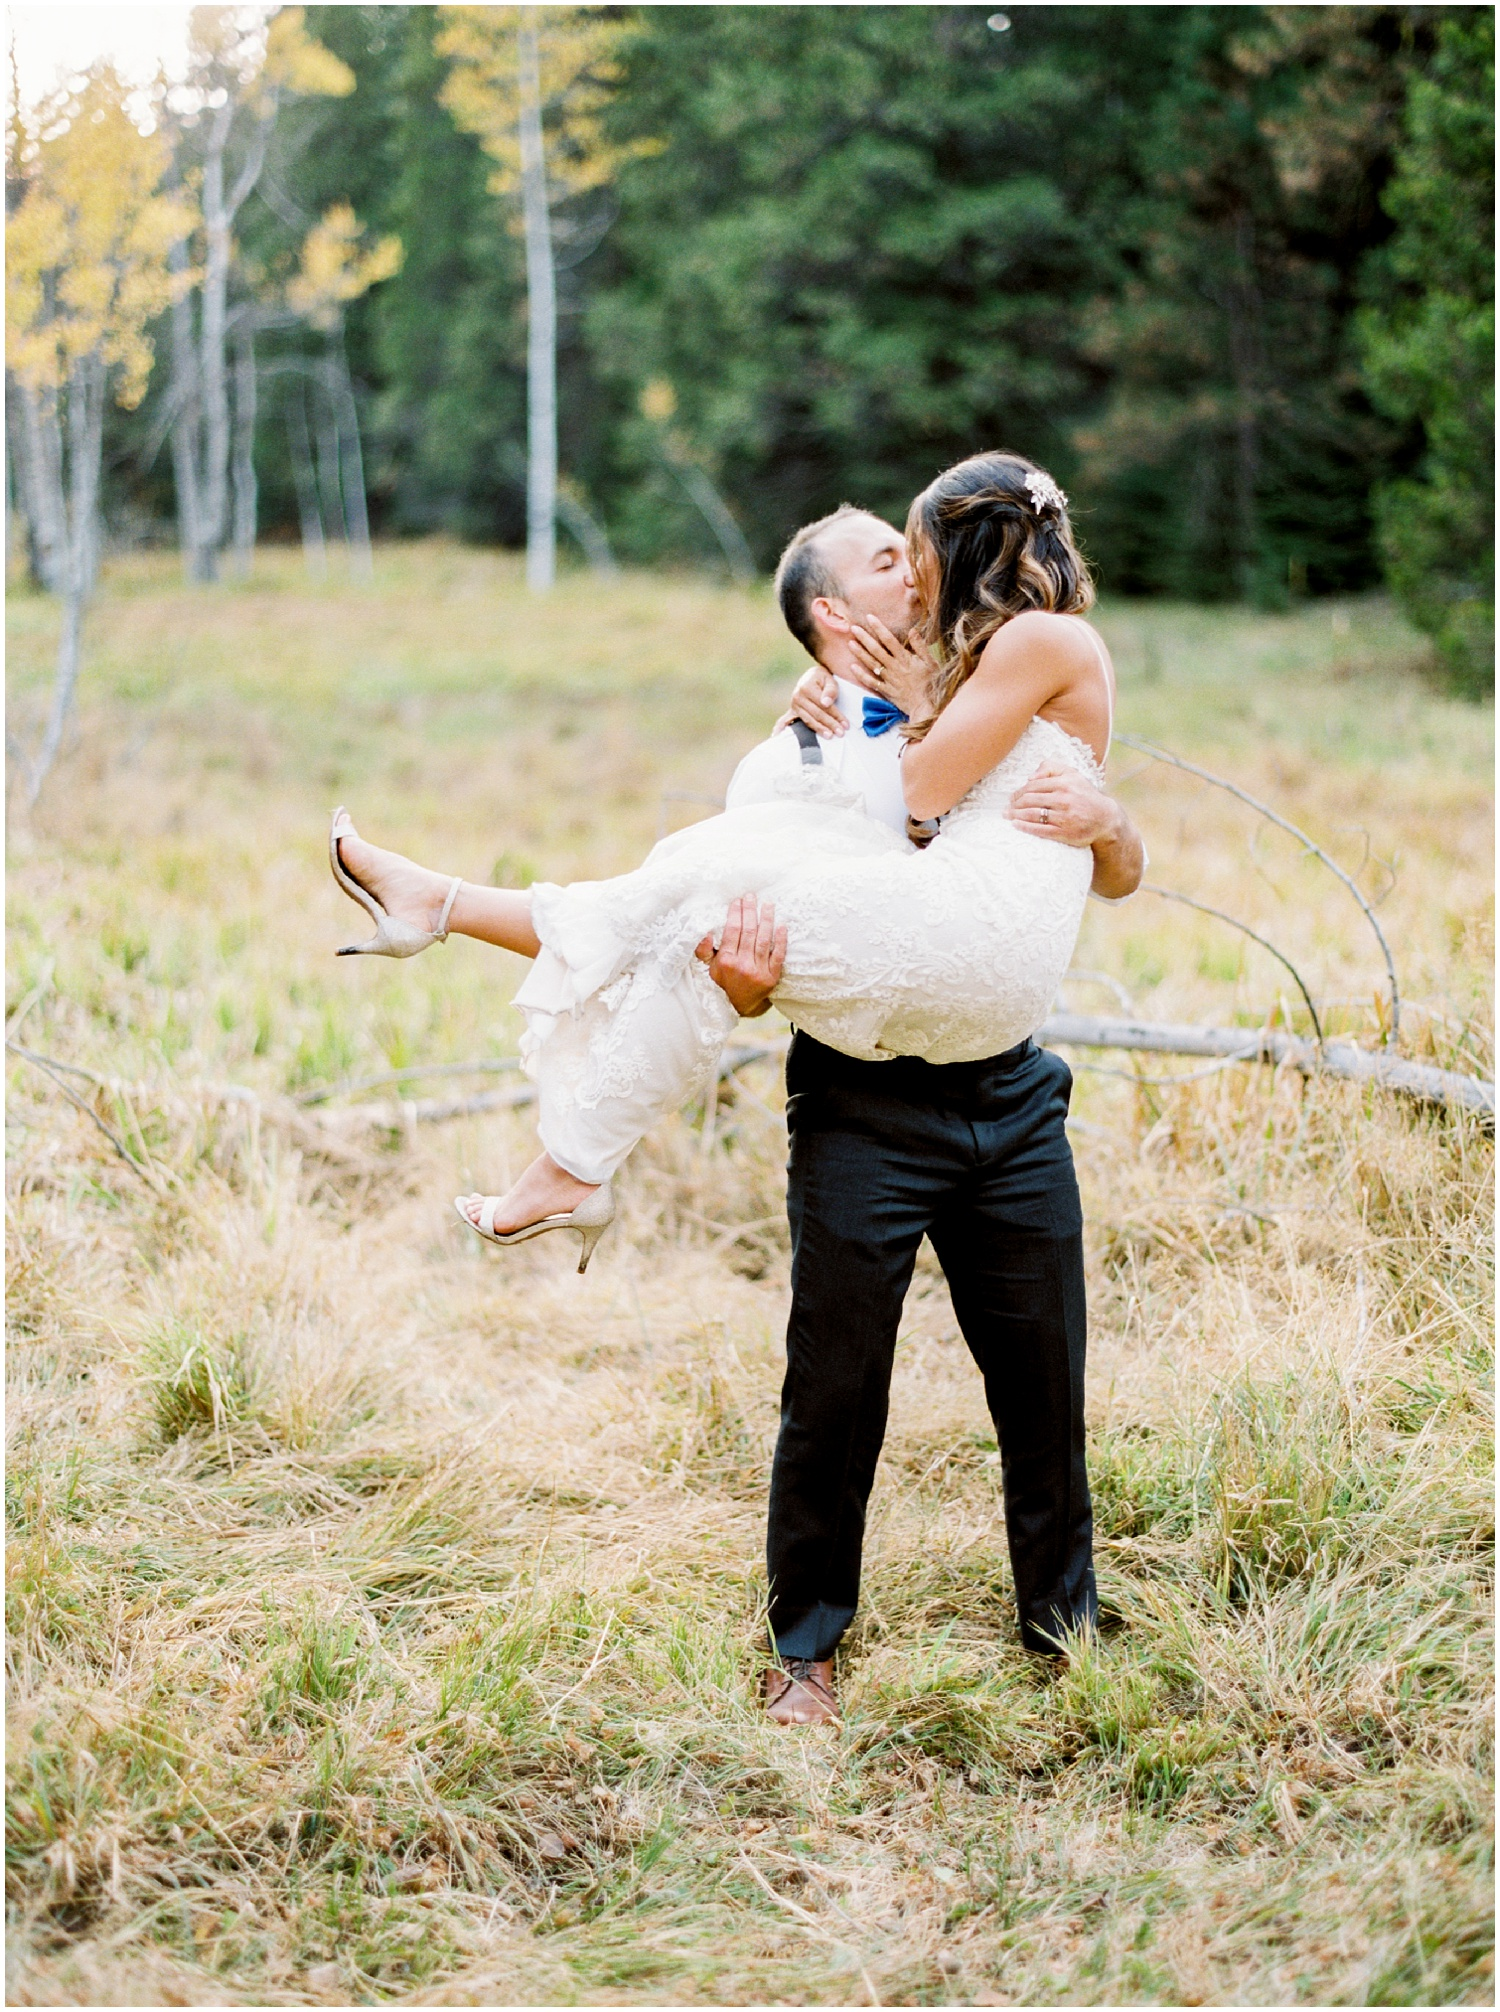 Fresno Wedding photography, Fresno Wedding photographers, California fine art wedding photographer, Fresno Wedding Photography, California Wedding Photographers, Yosemite wedding photographer